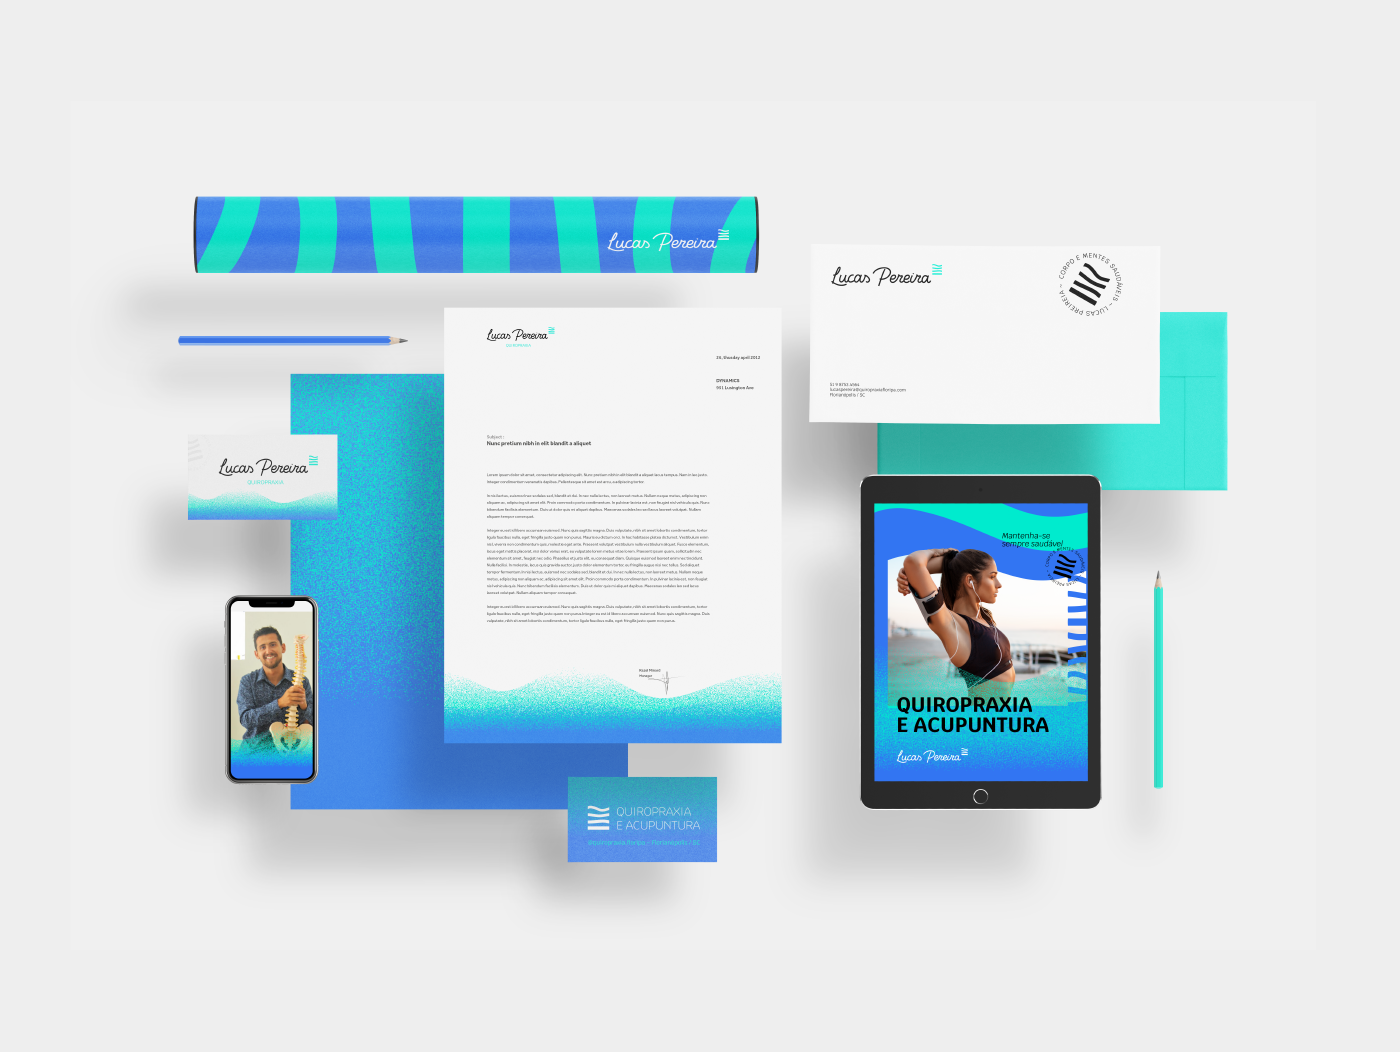 acupuncture beach Brand Design branding  Chiropractic identidade visual Surf visual identity